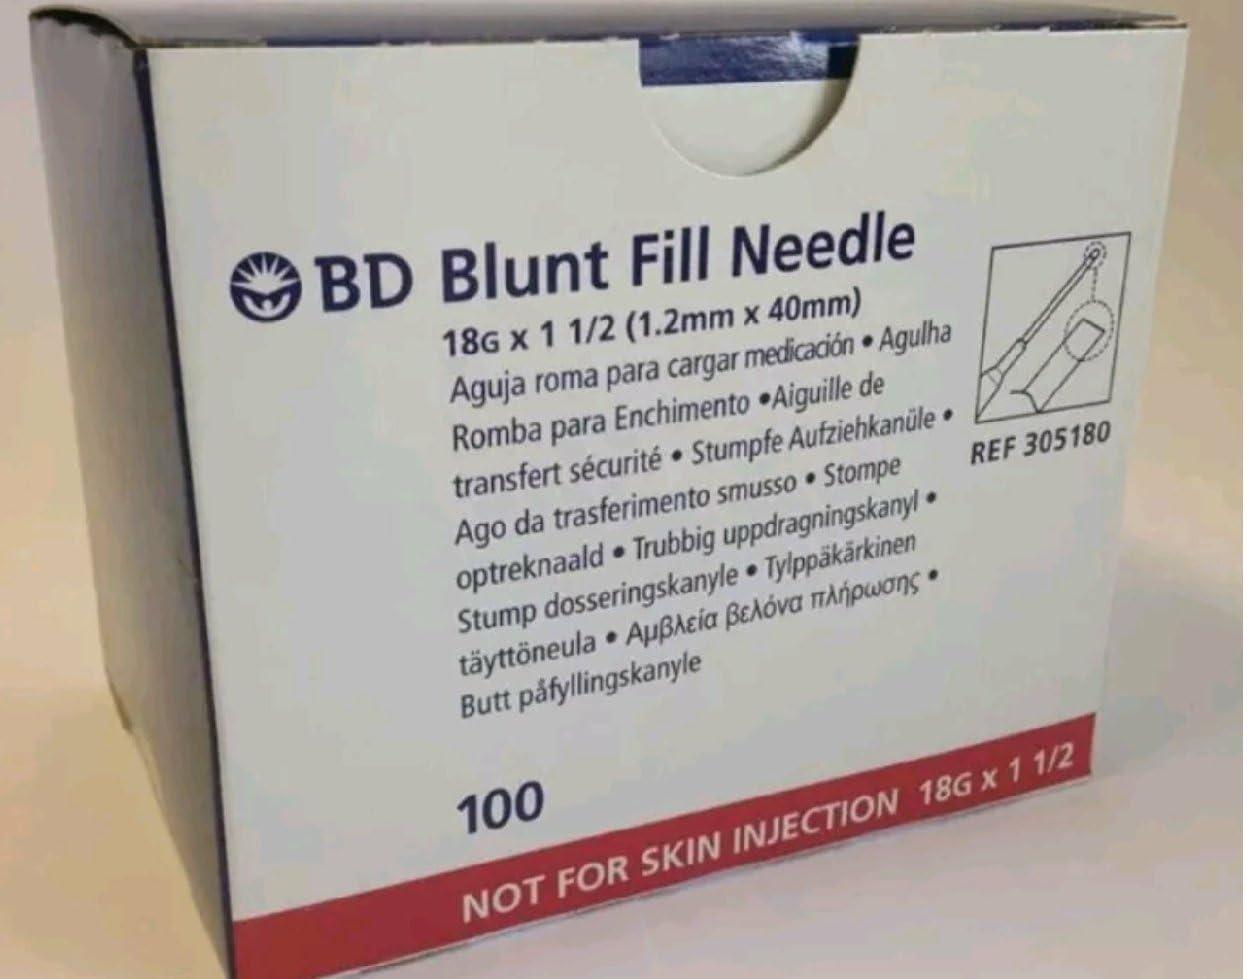 Becton-Dickinson Spasm price Blunt Fill Medication Transfer Gauge Needle Over item handling ☆ 18